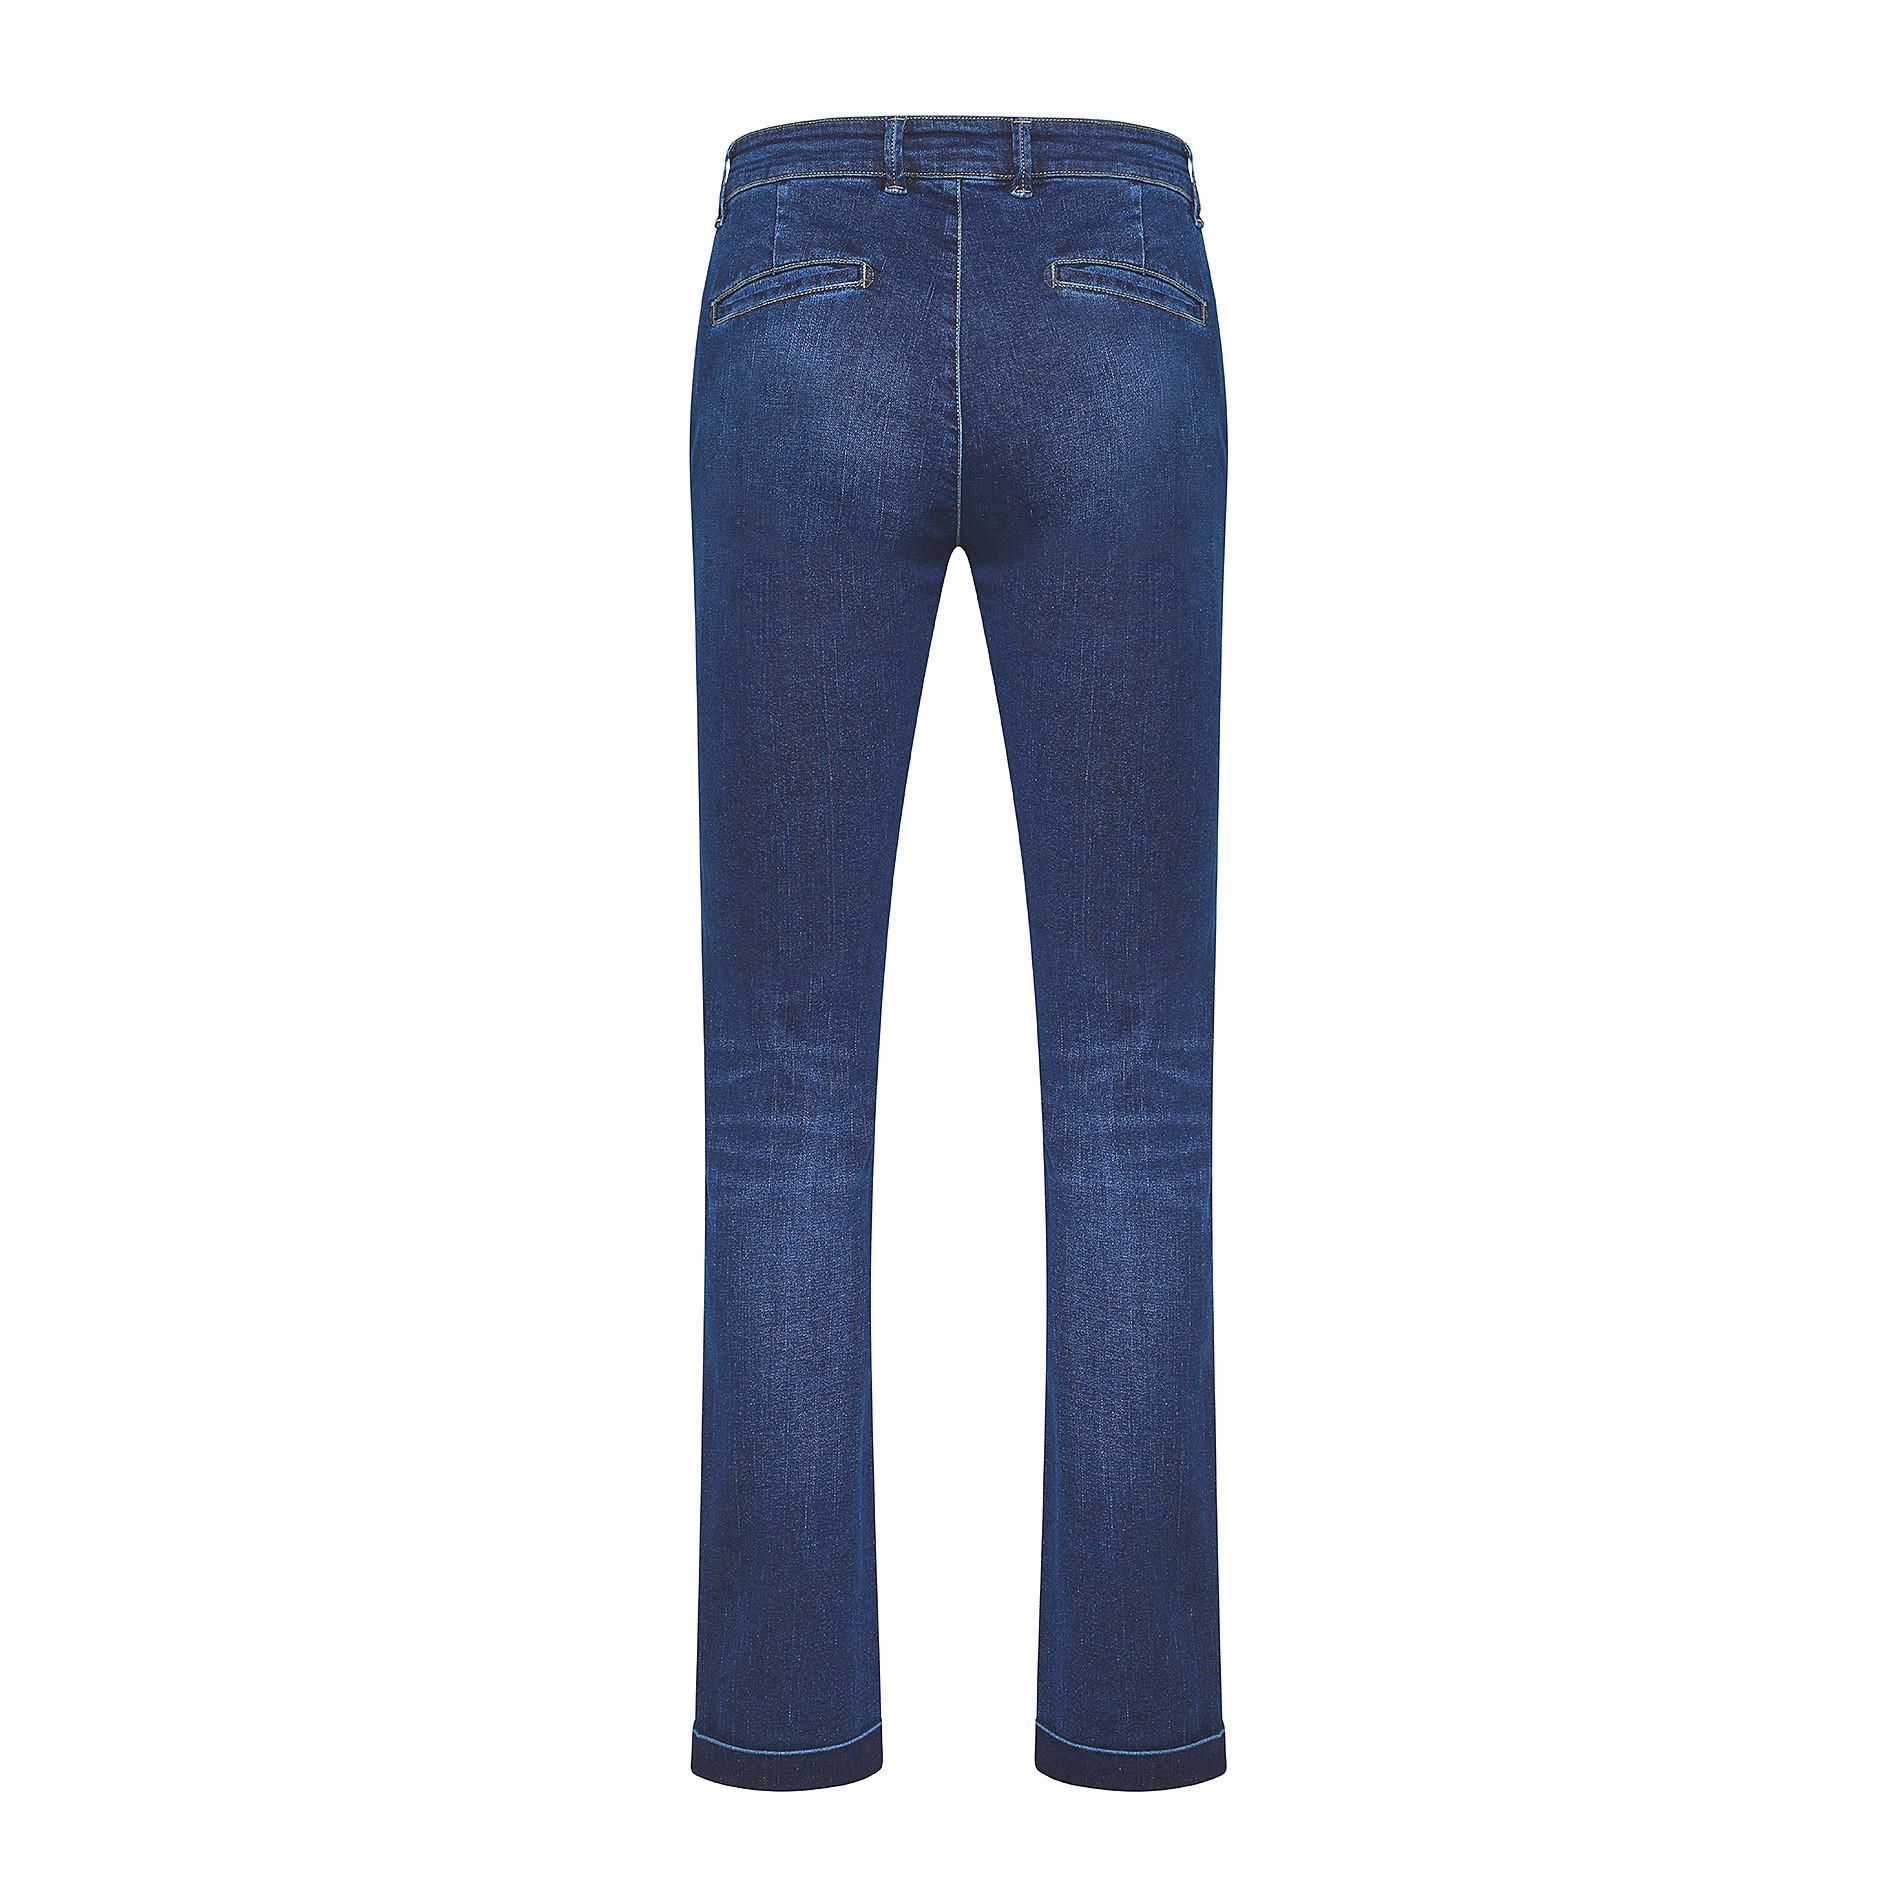 Pantalone chino denim stretch JCT, Blu scuro, large image number 1